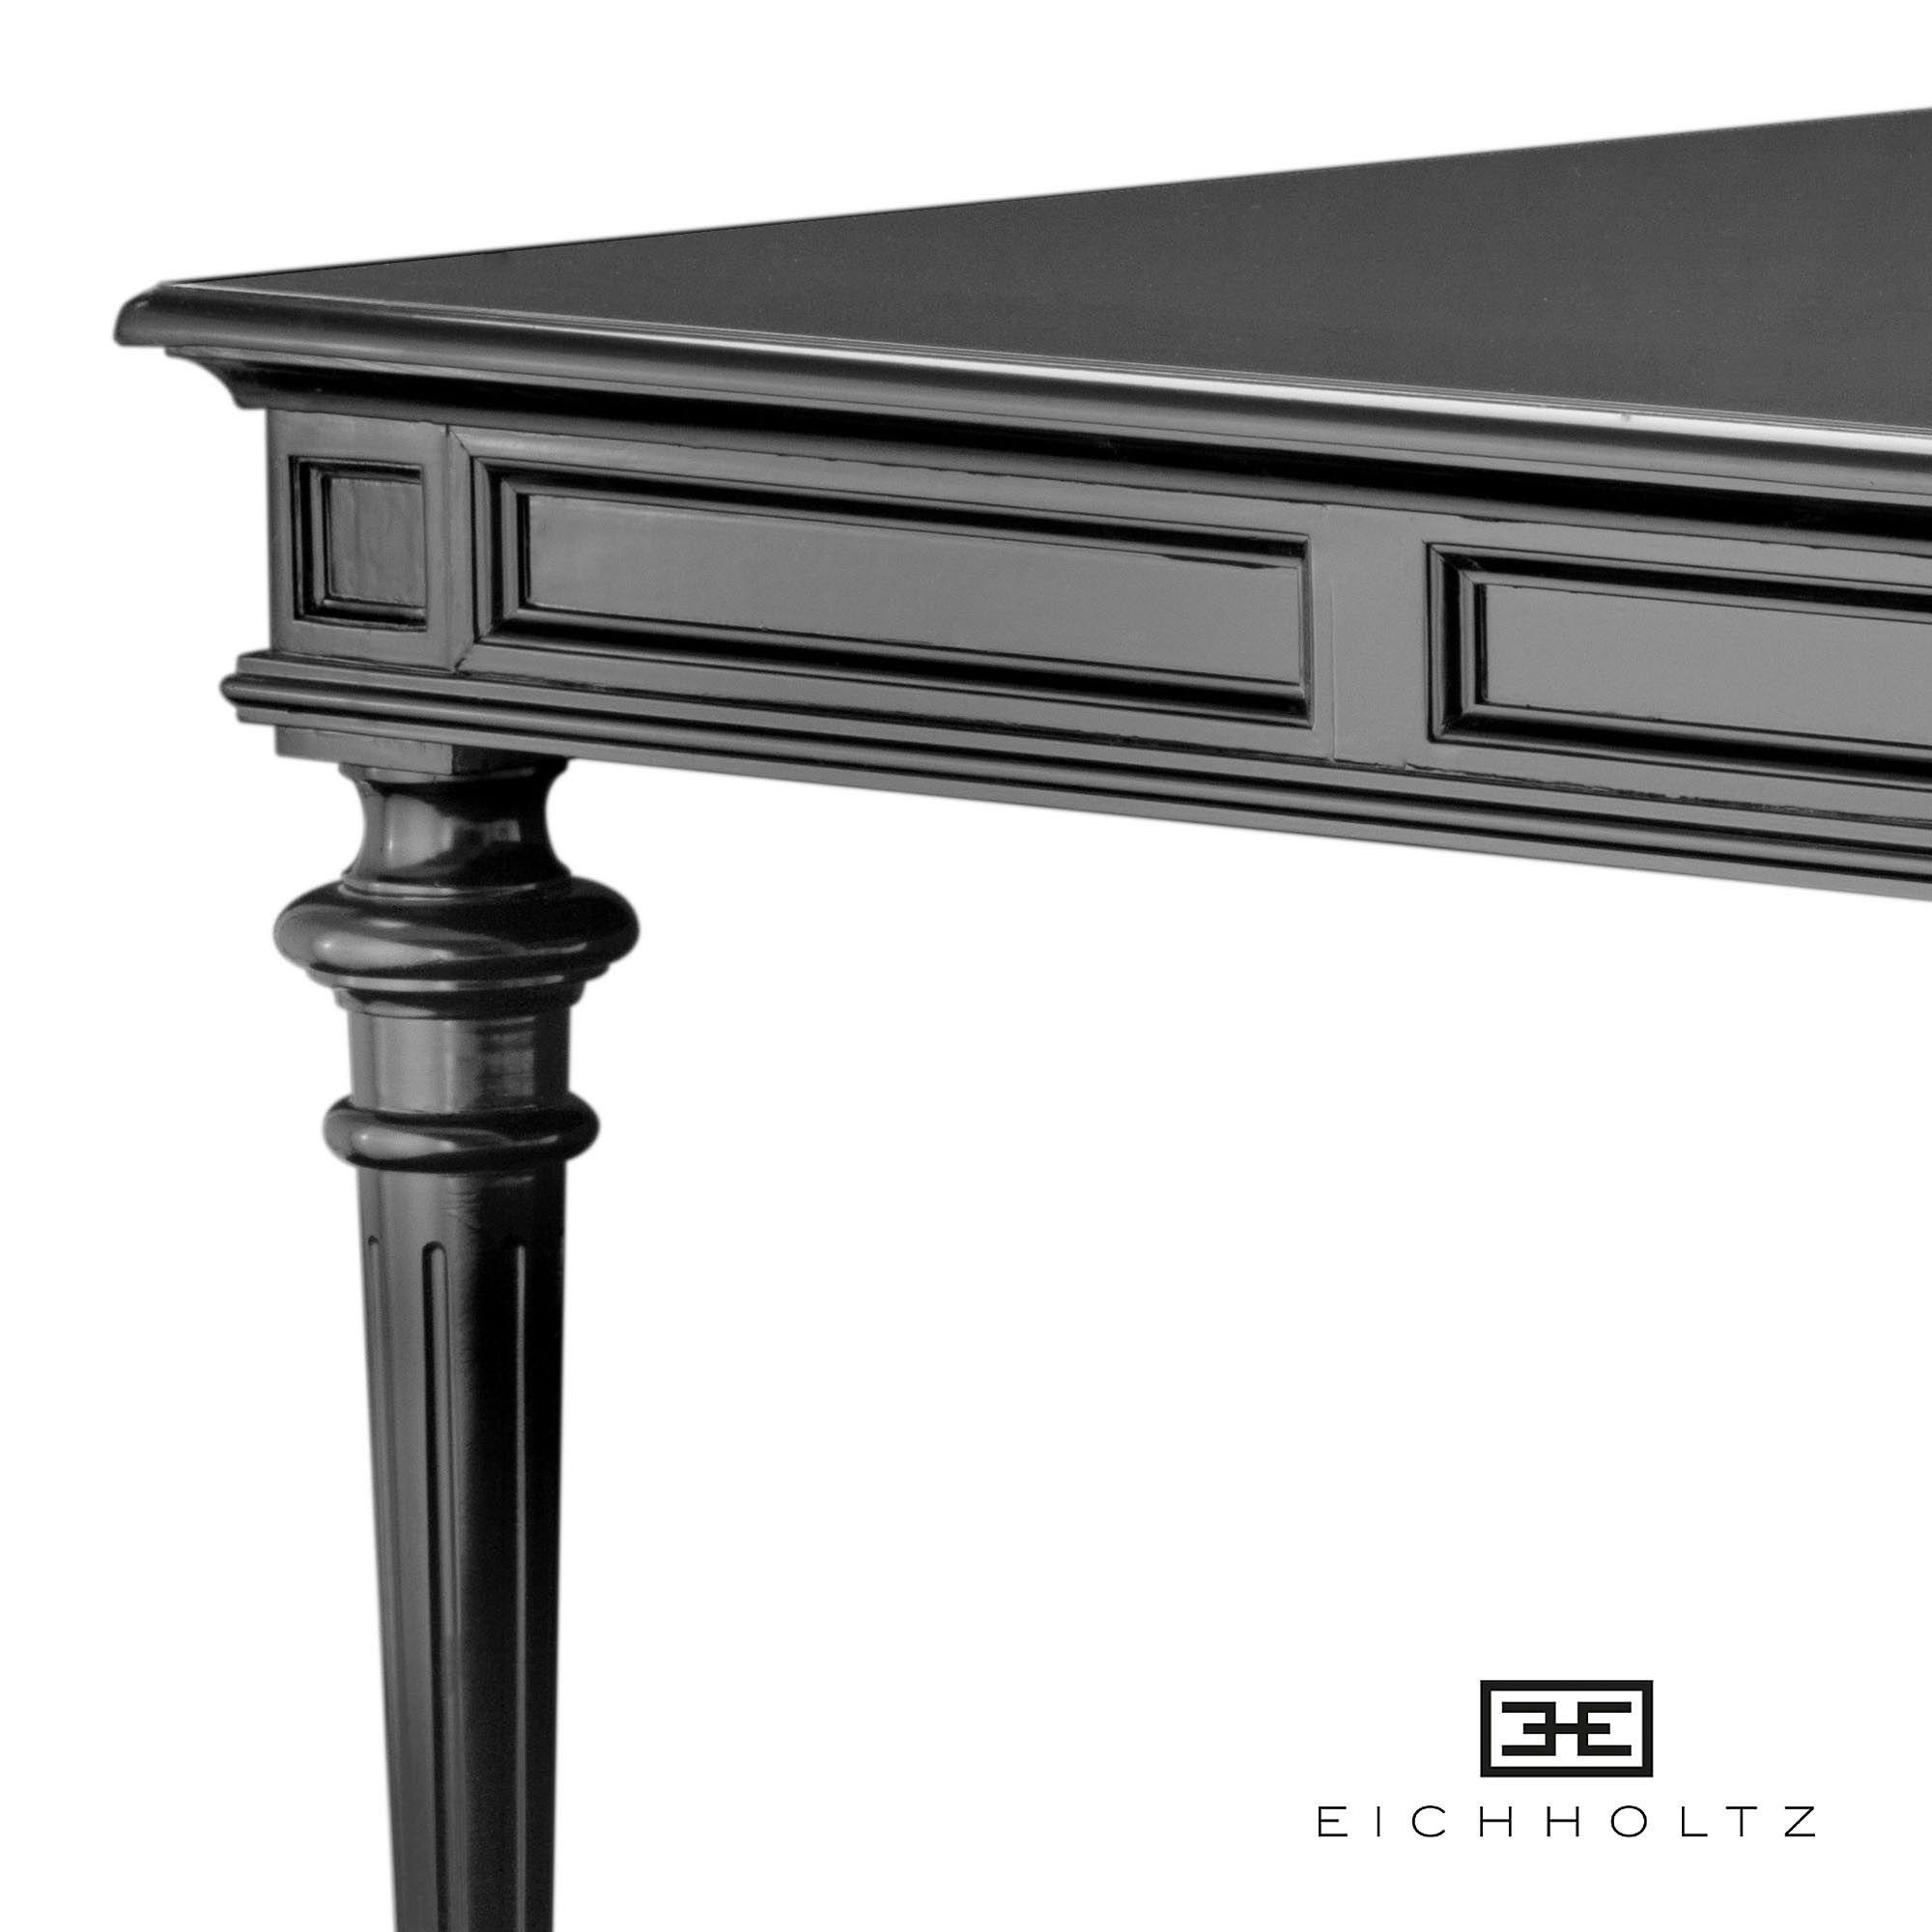 Zwarte Klassieke Sidetable.Eichholtz Zwarte Klassieke Tafel Dining Table Wallace 210cm